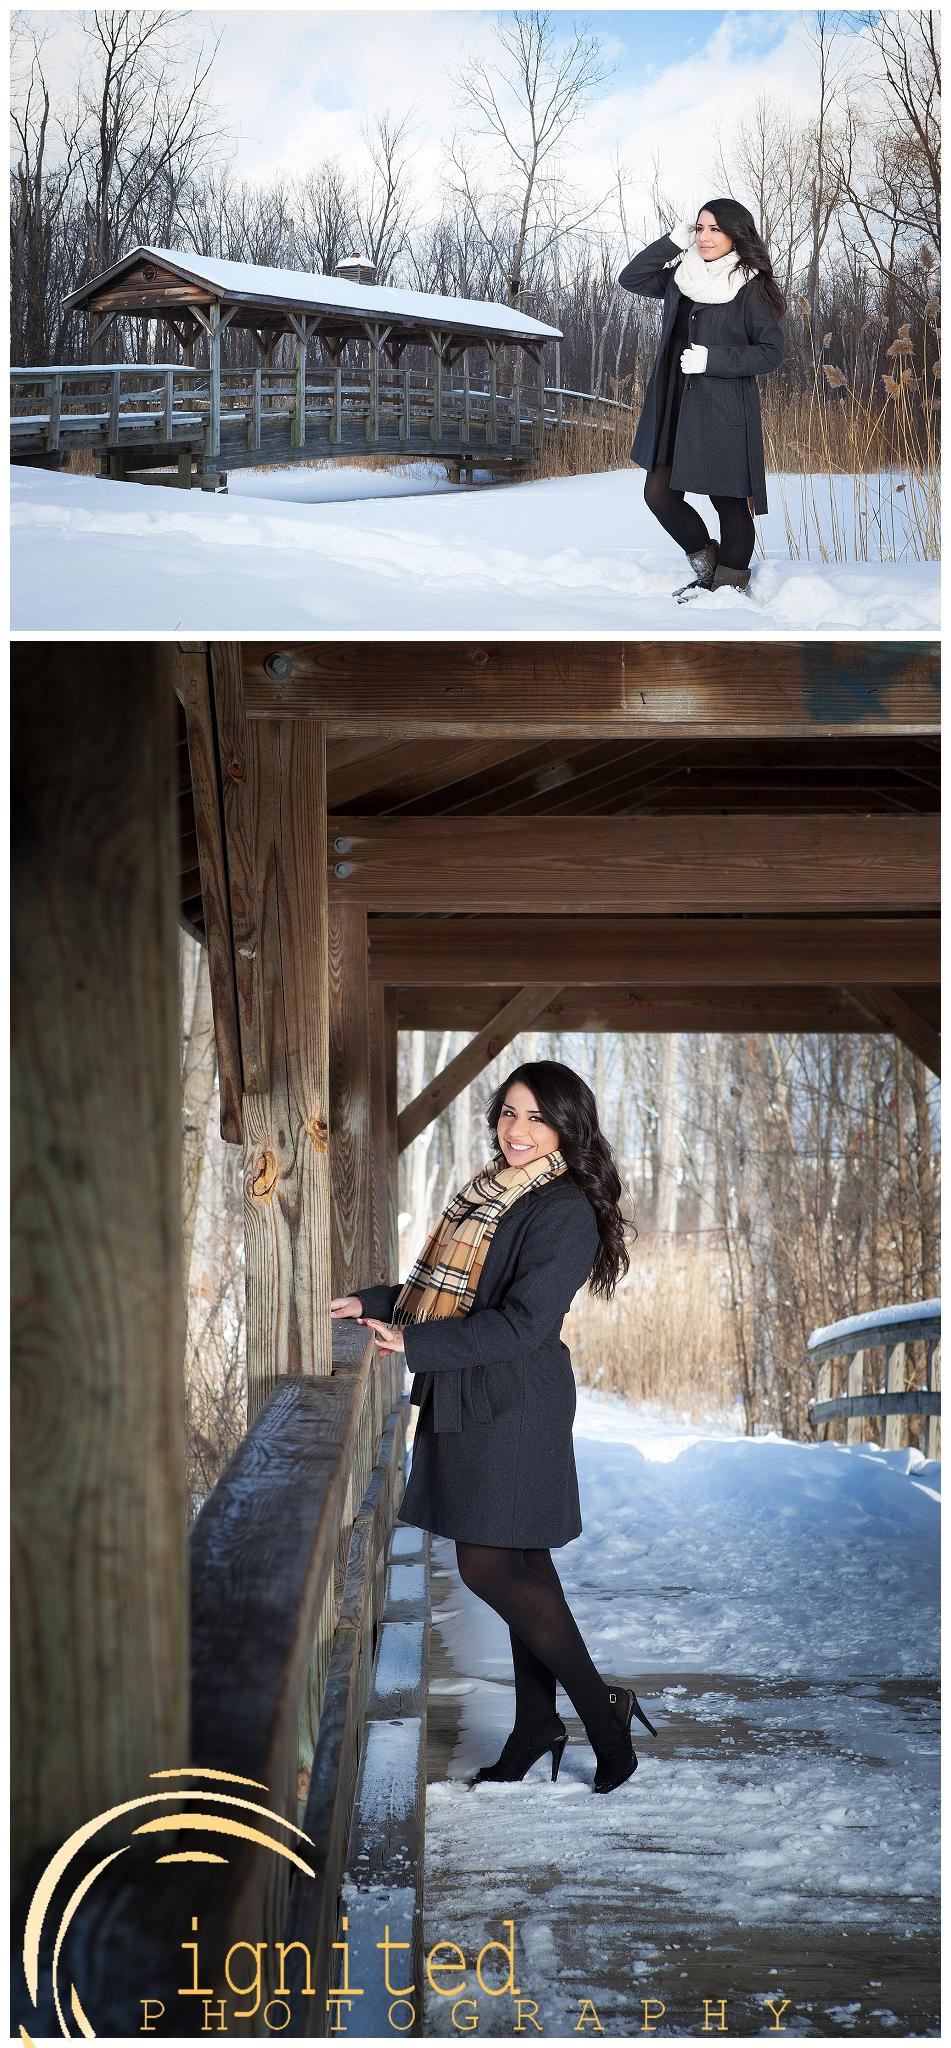 Mary Mansour - winter_0004.jpg